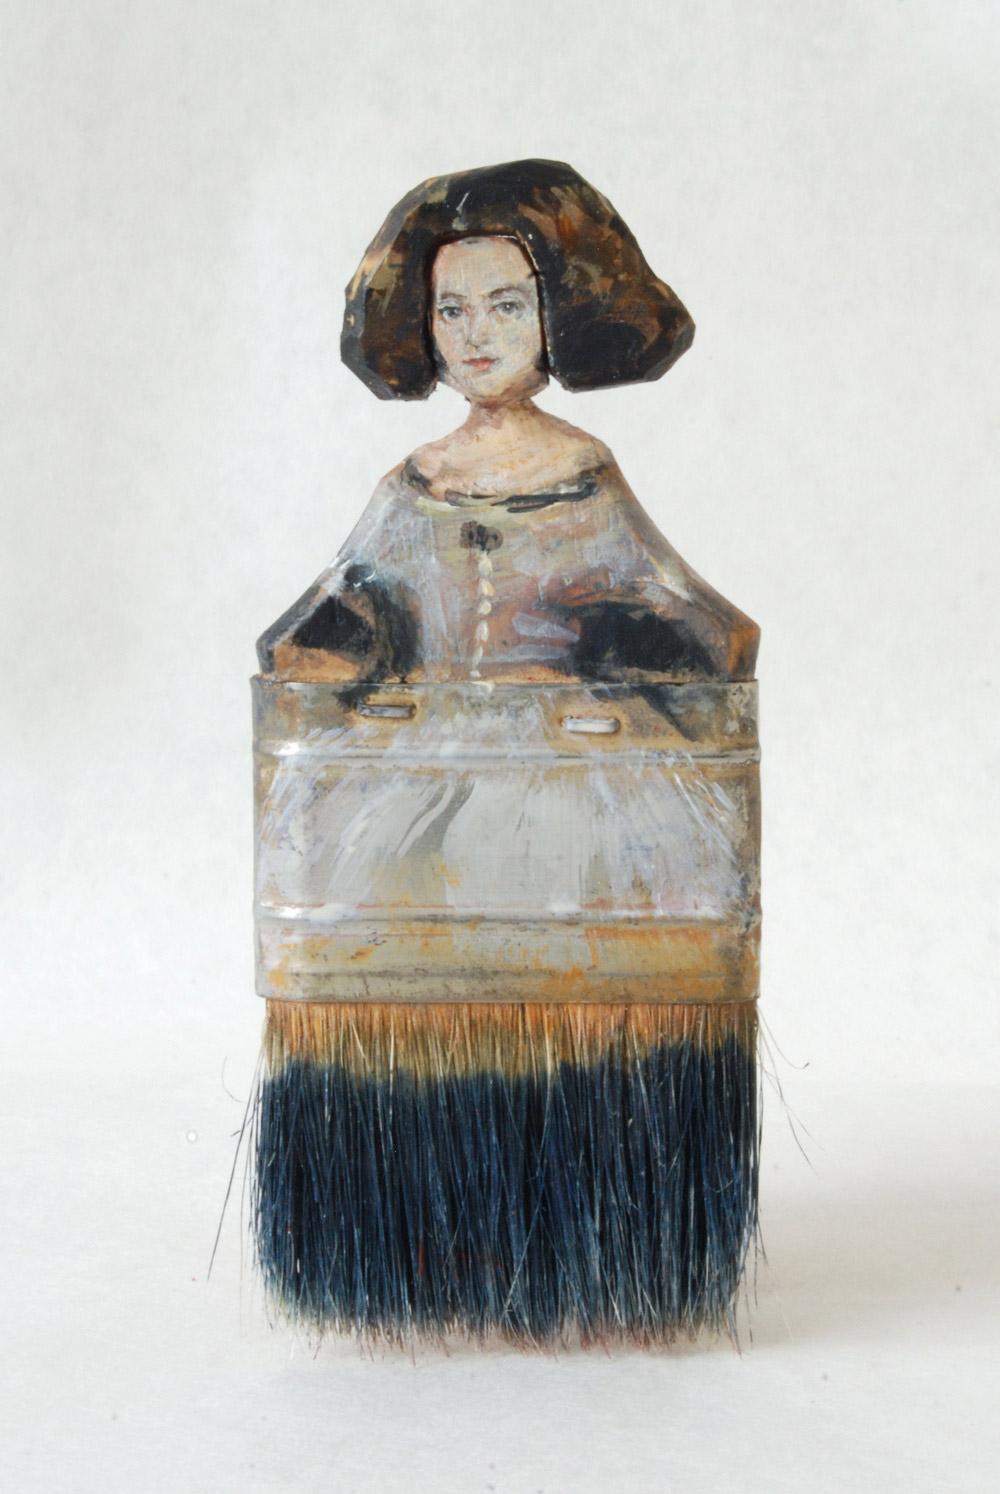 artist rebecca szeto transforms old paintbrushes into